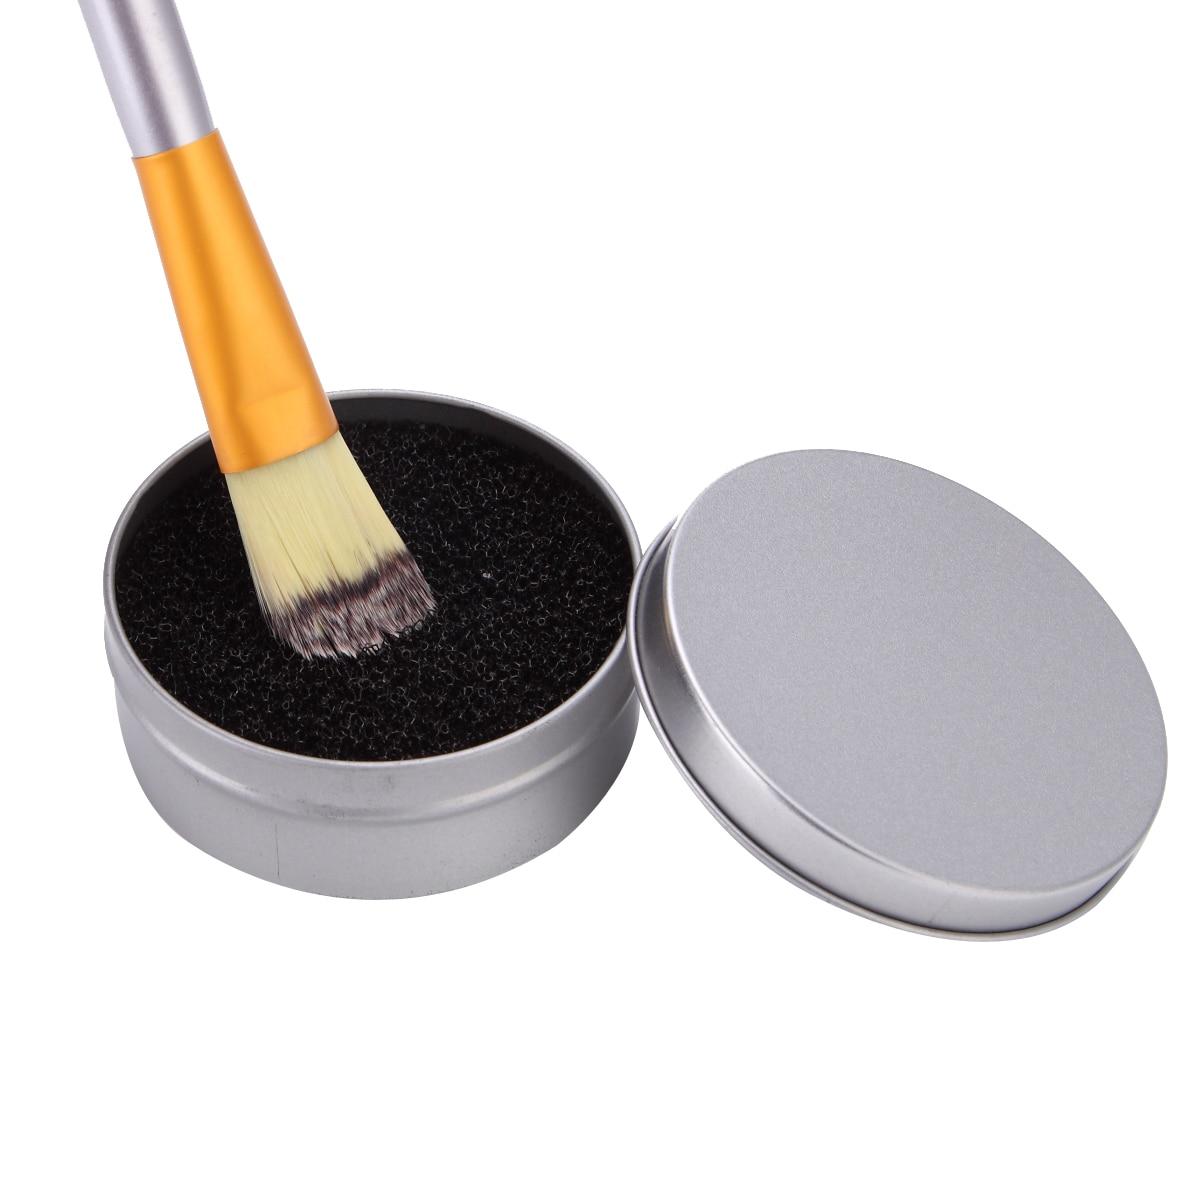 Round Sponge Brush Cosmetic Cleaner Iron Box Eye Lip Nose Face Makeup Brushes Blush Dust Powder